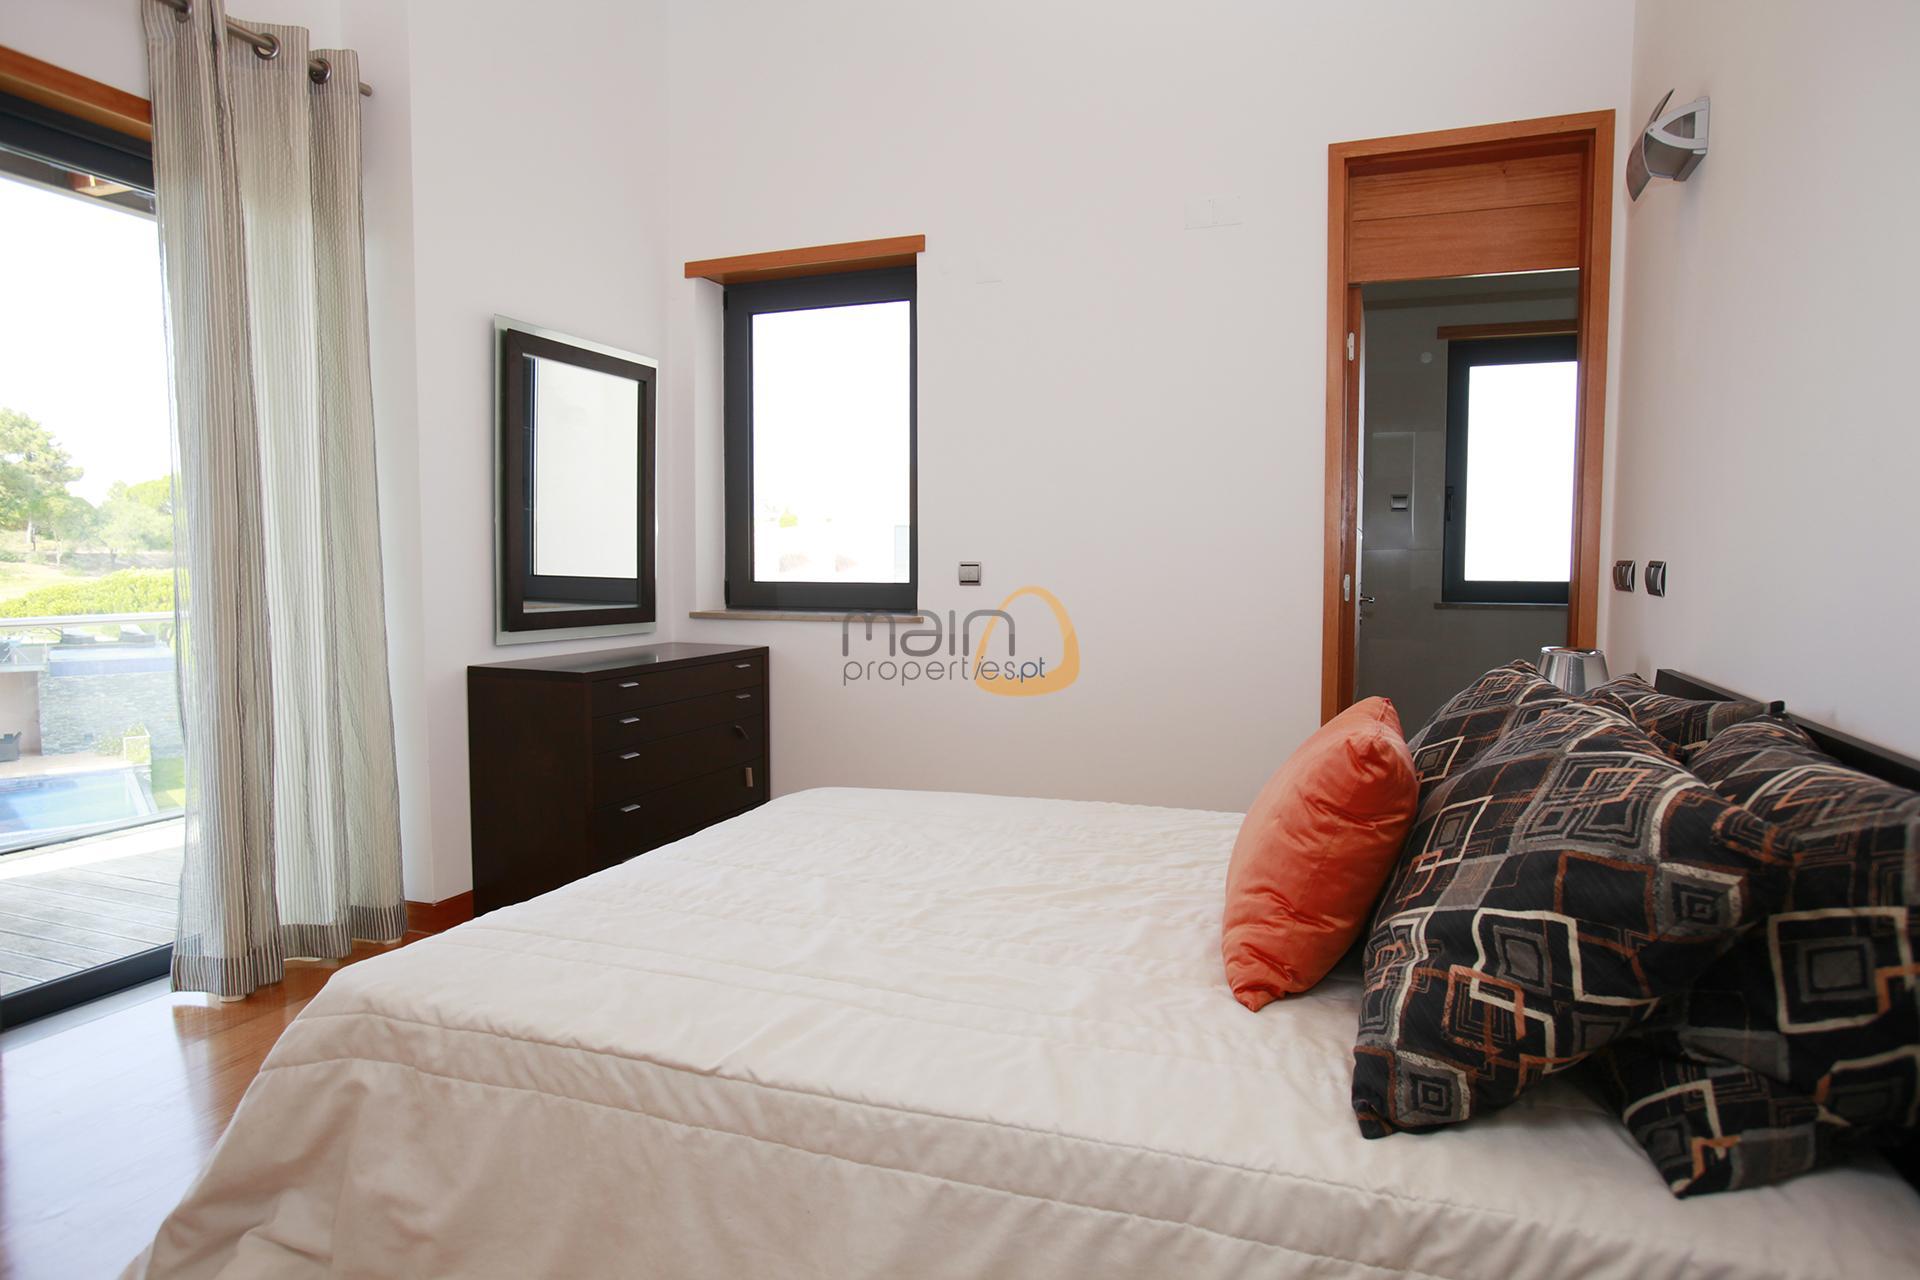 apartment-in-vale-do-lobo-algarve-golden-triangle-portugal-property-real-estate-mainproperties-mp135vdl-4